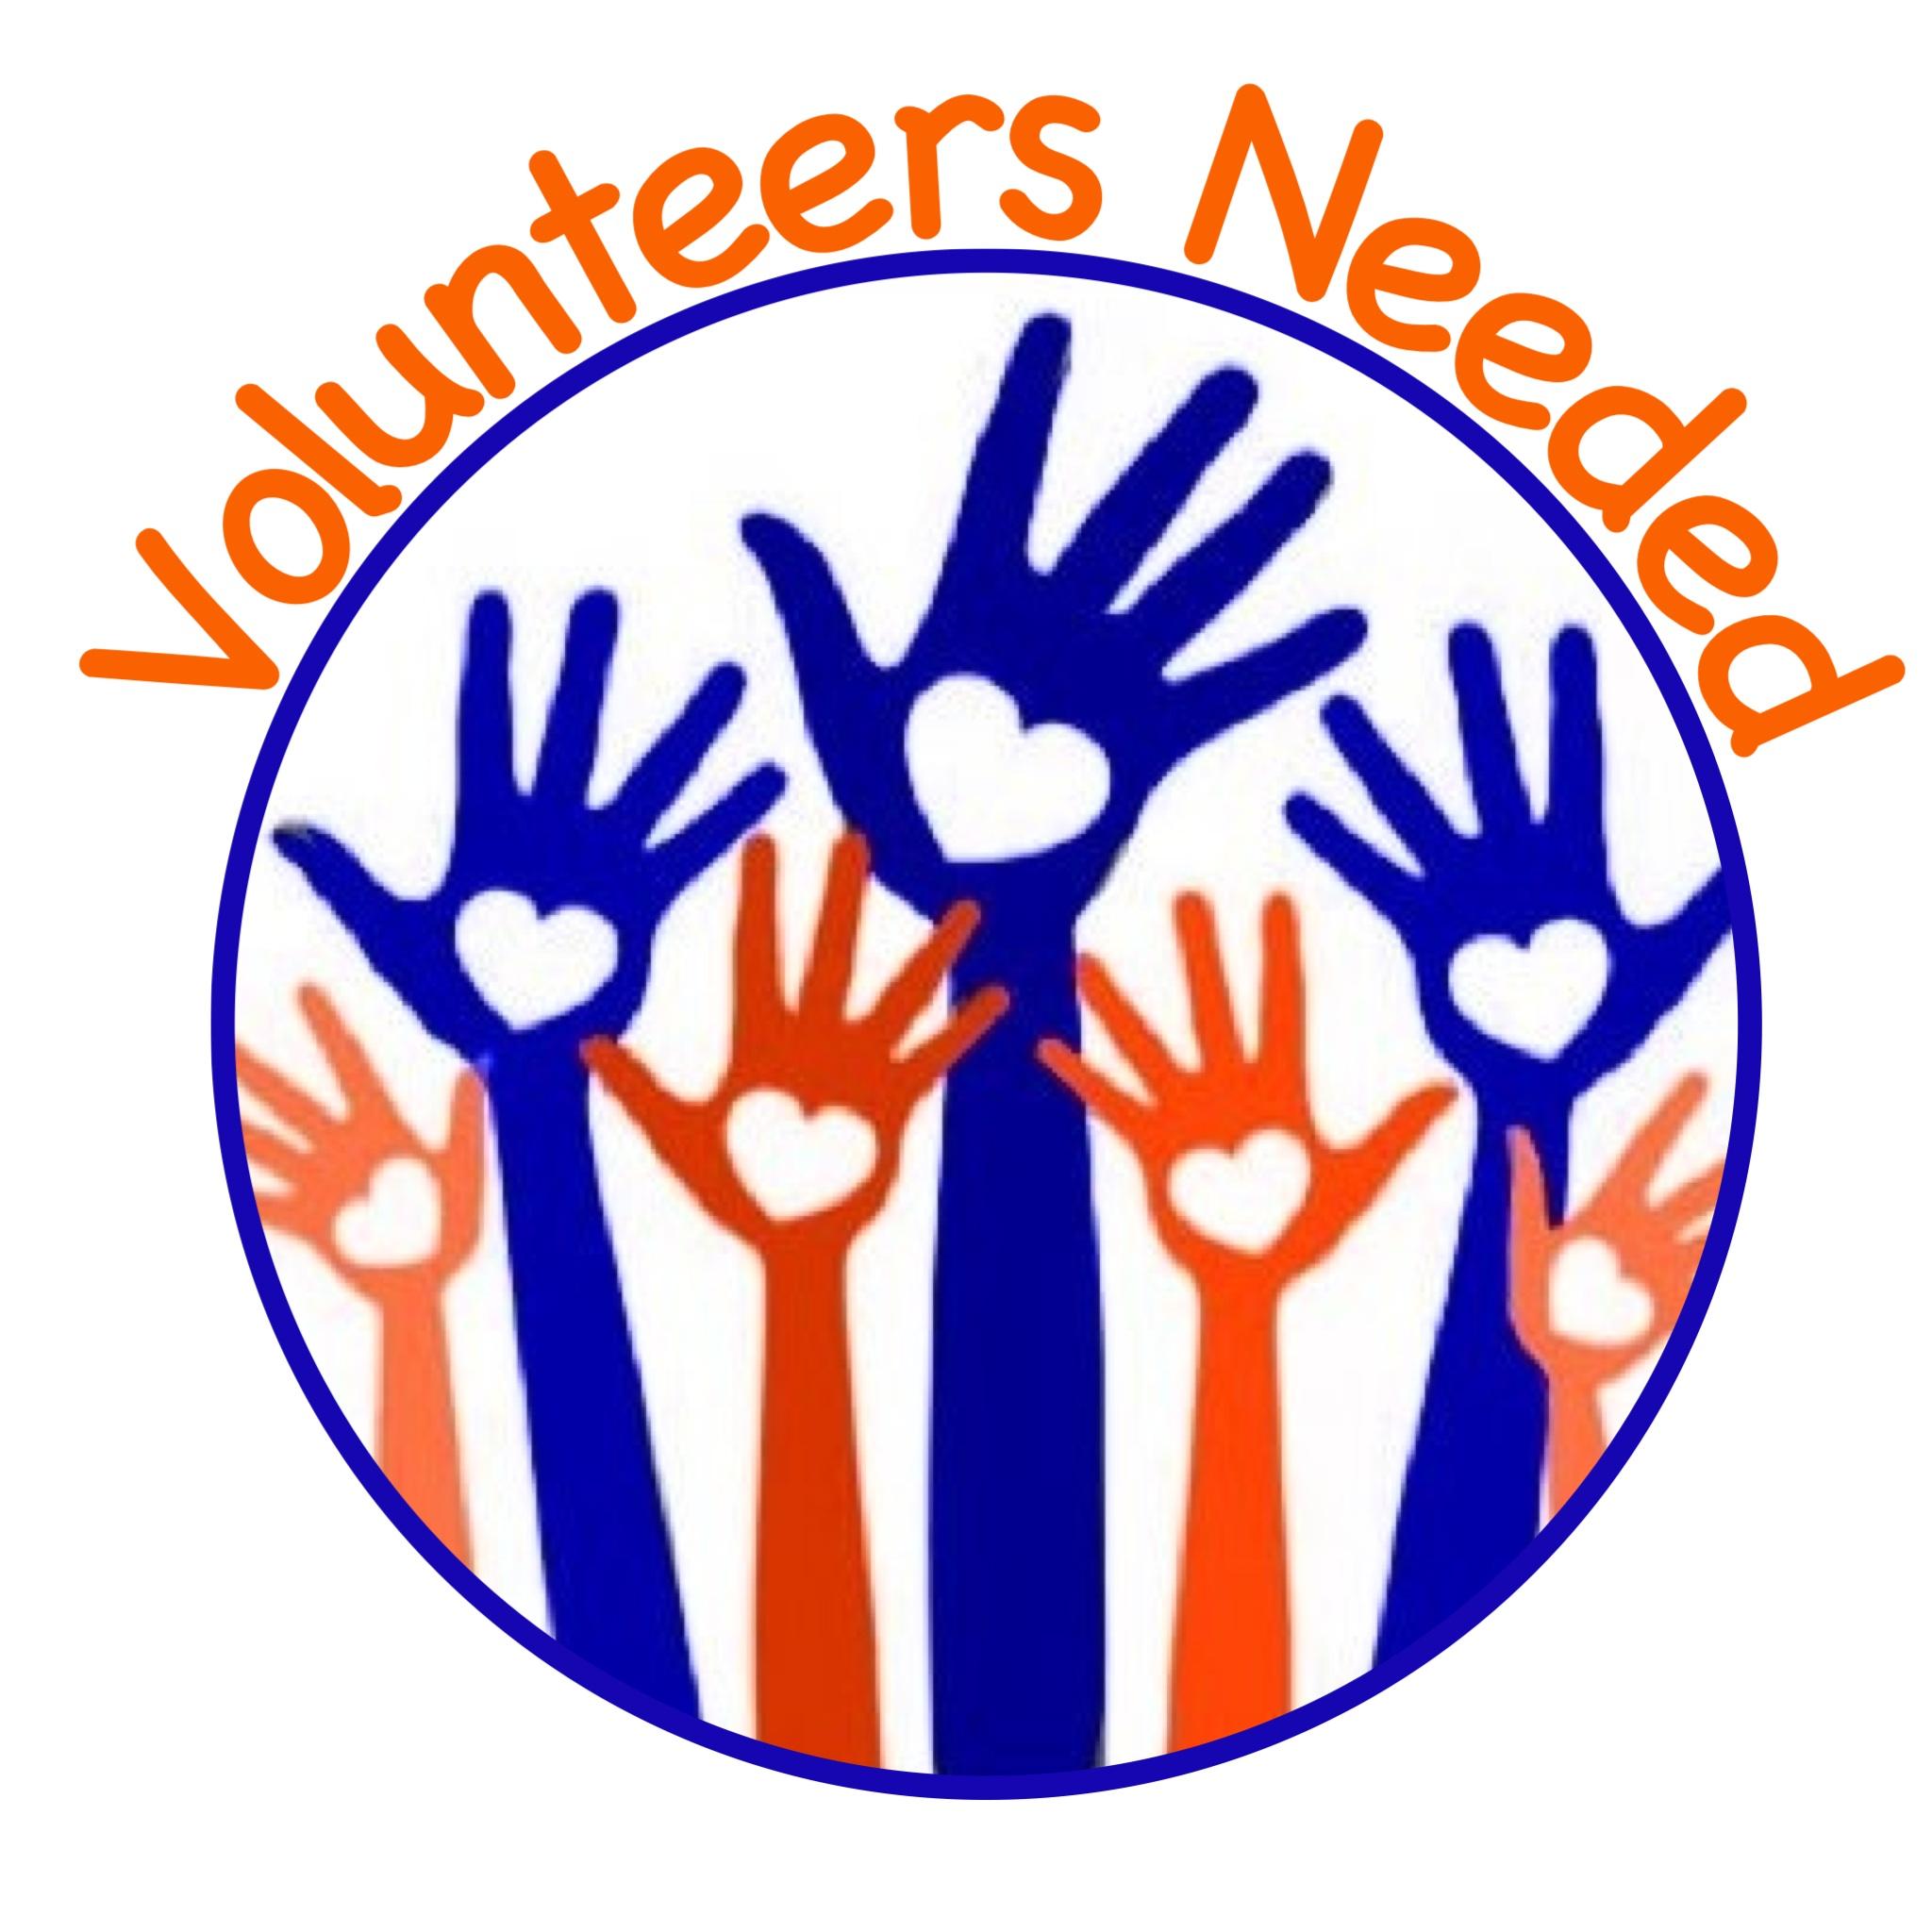 2048x2048 Volunteer Sign Up Clip Art Clipart Free Download